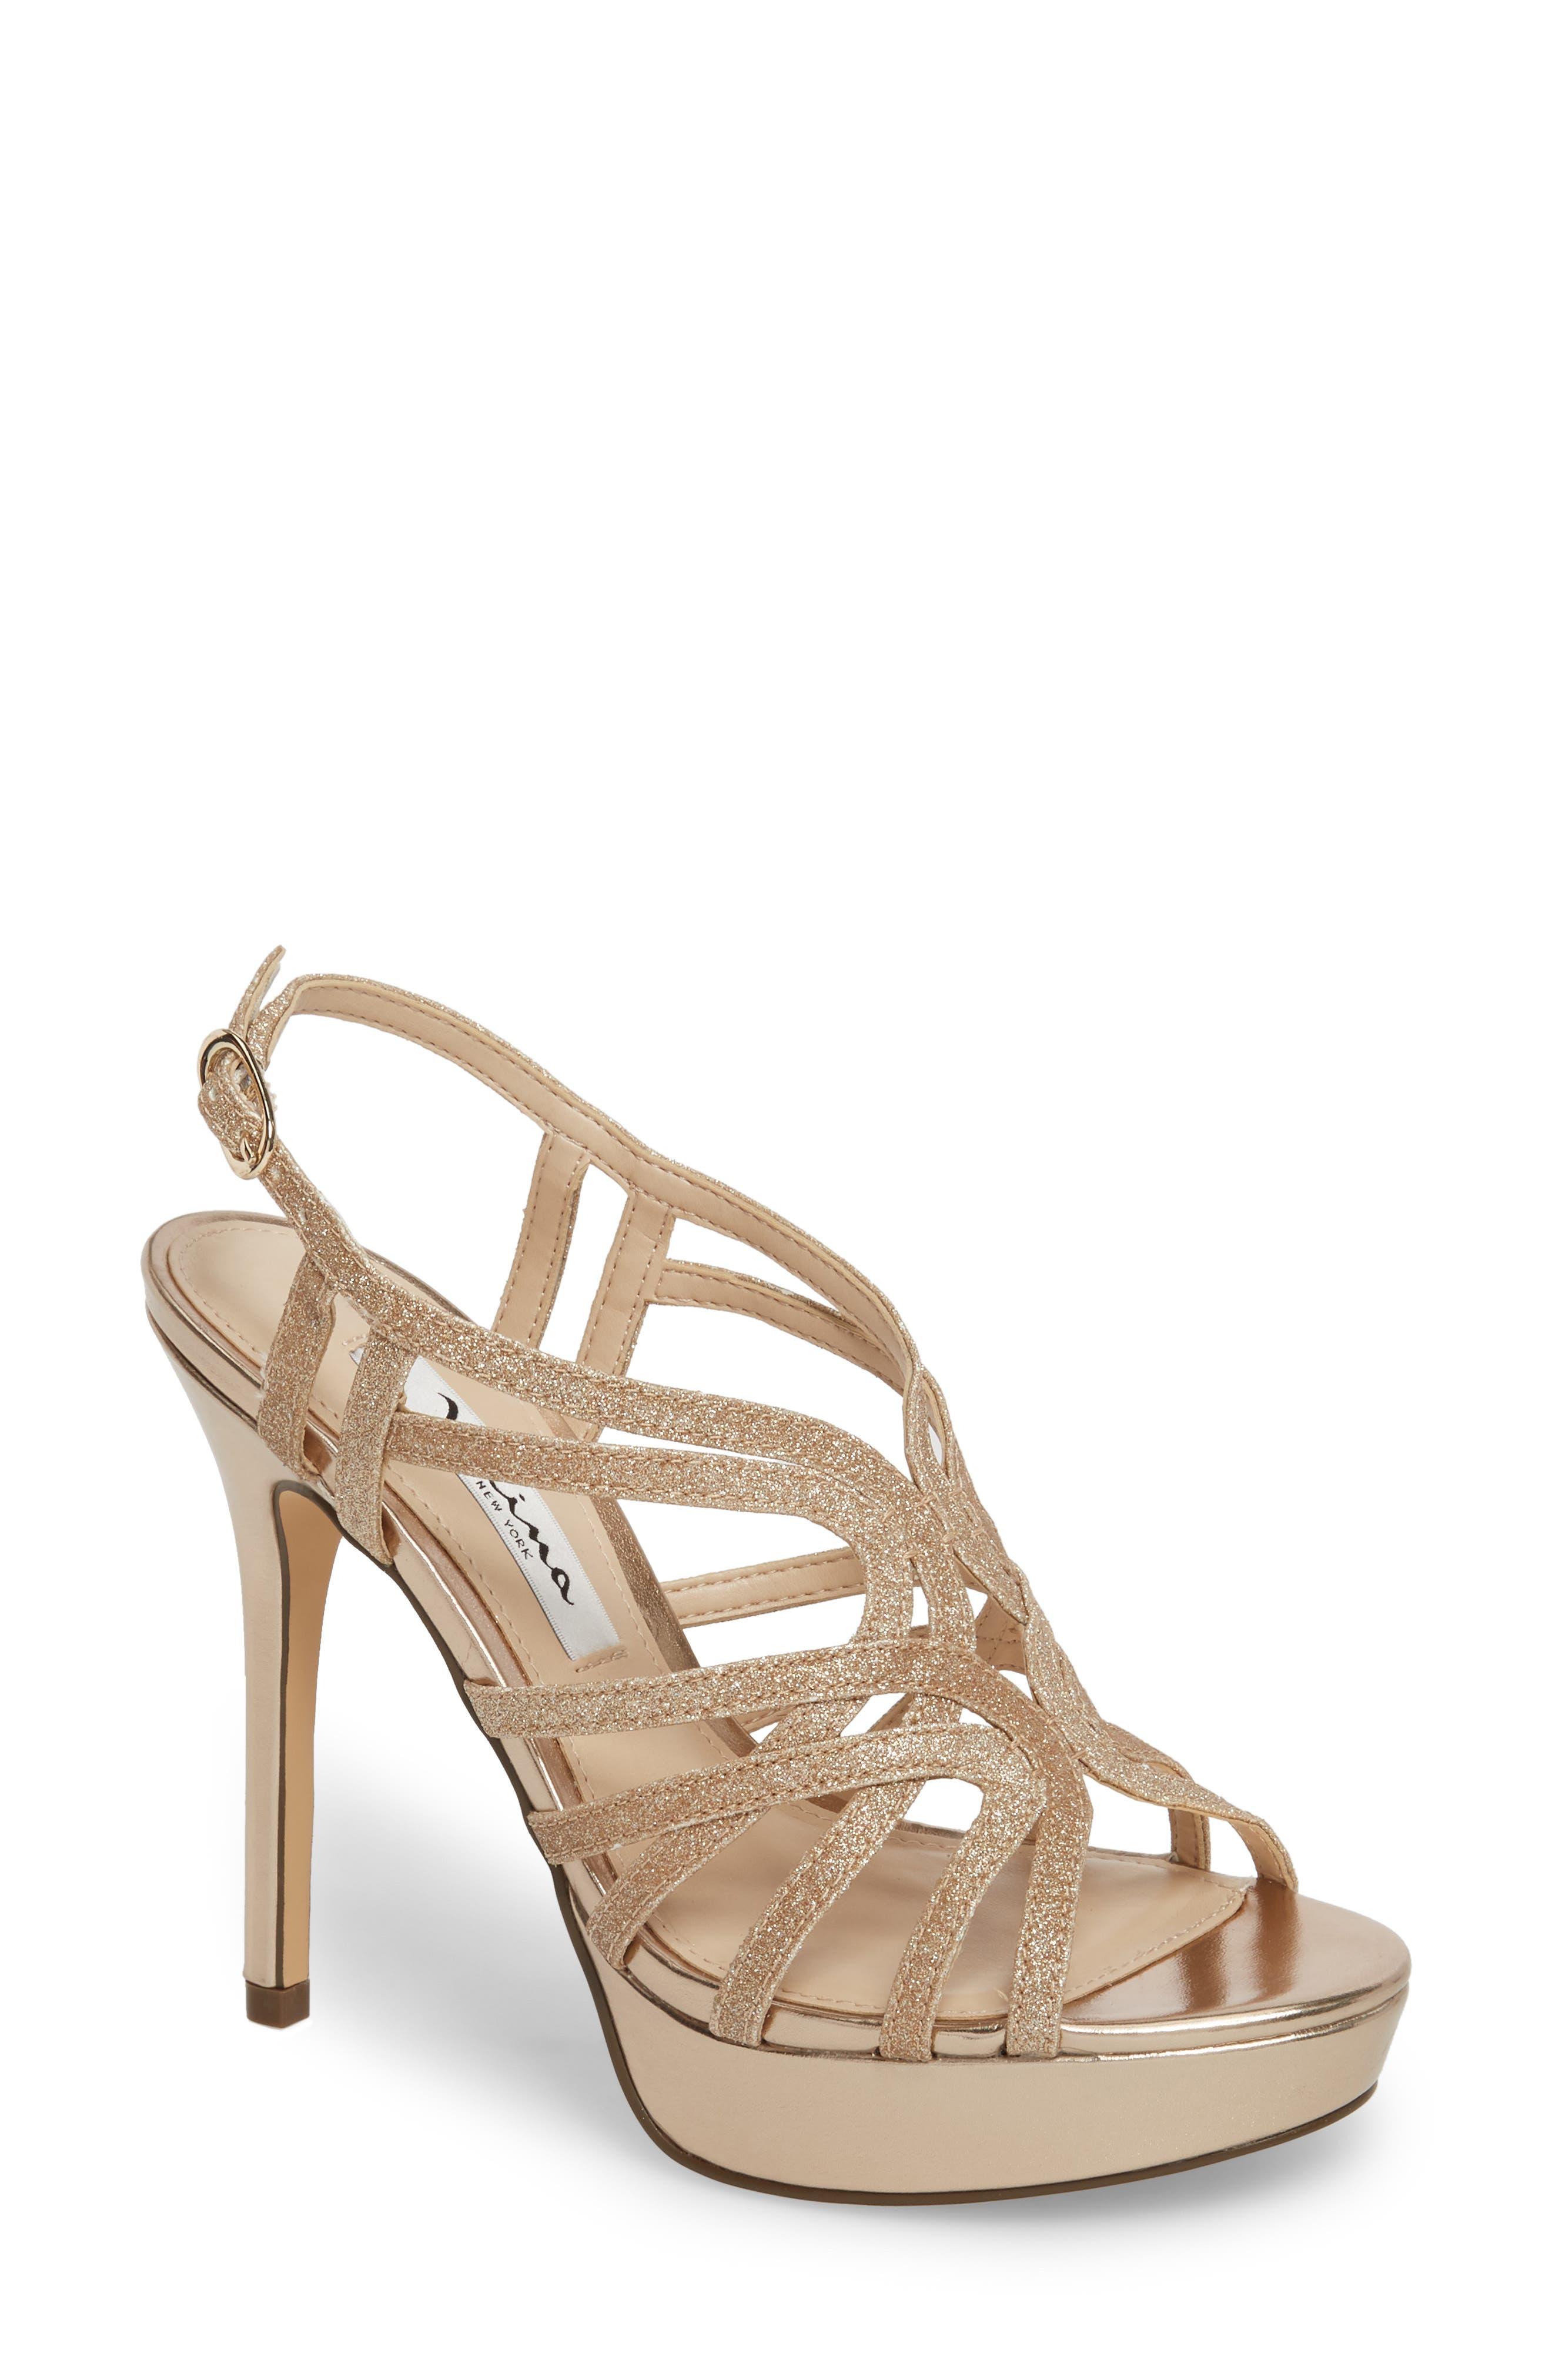 Solina Platform Sandal,                         Main,                         color, Gold Glitter Fabric